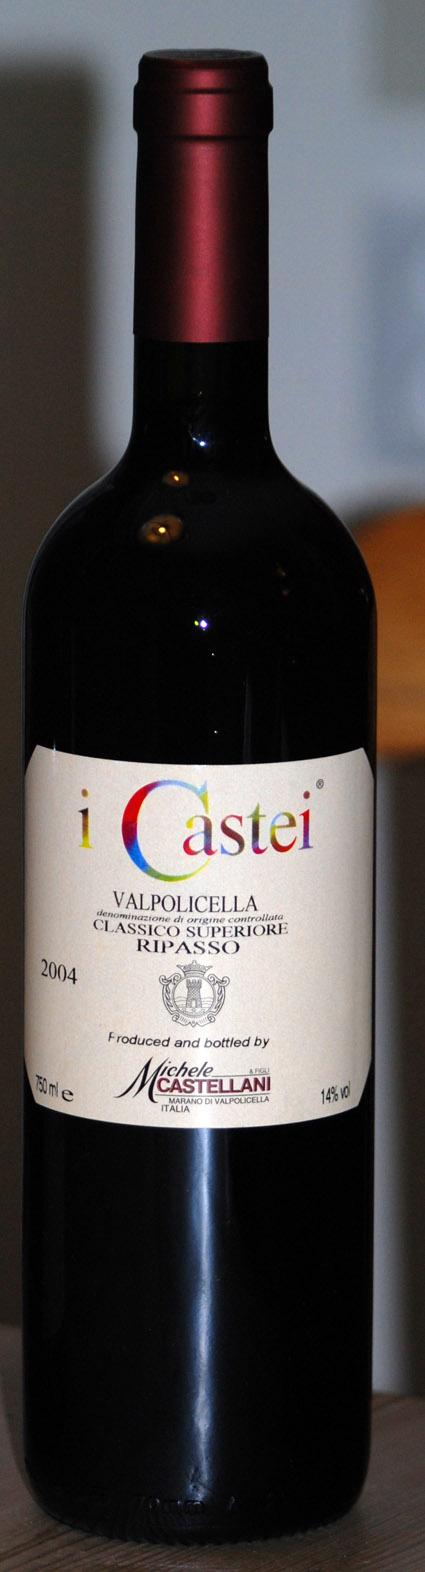 i Castei Ripasso ( Castellani ) 2017